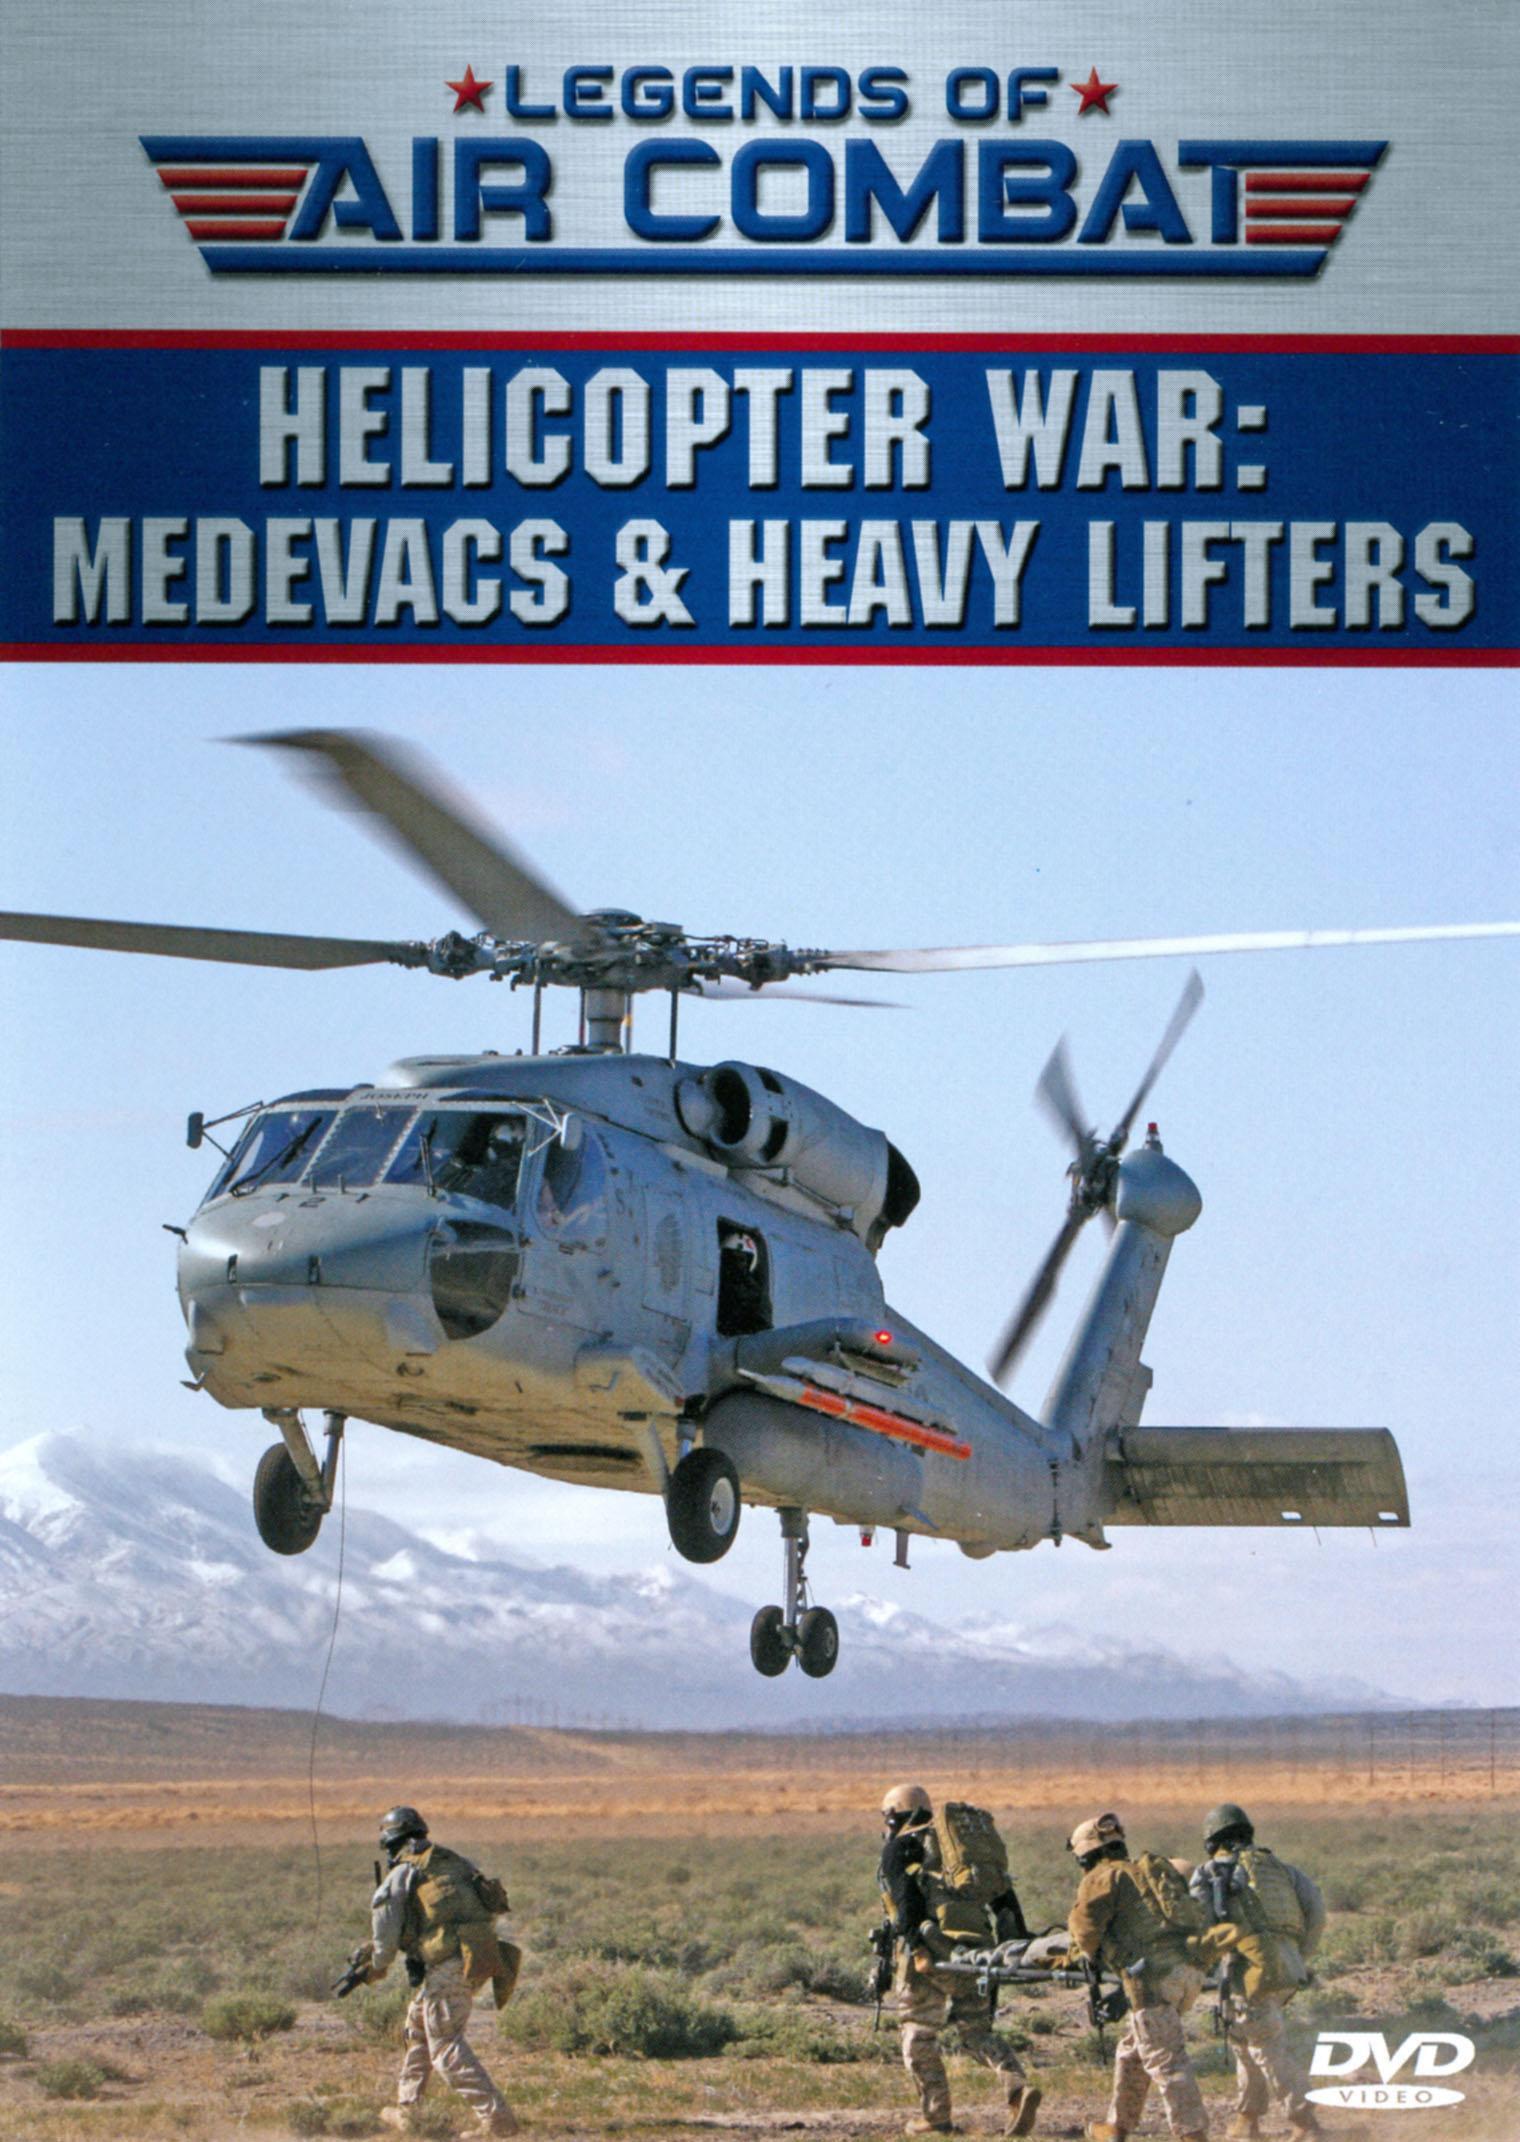 Legends of Air Combat: Helicopter War - Medevacs & Heavy Lifters